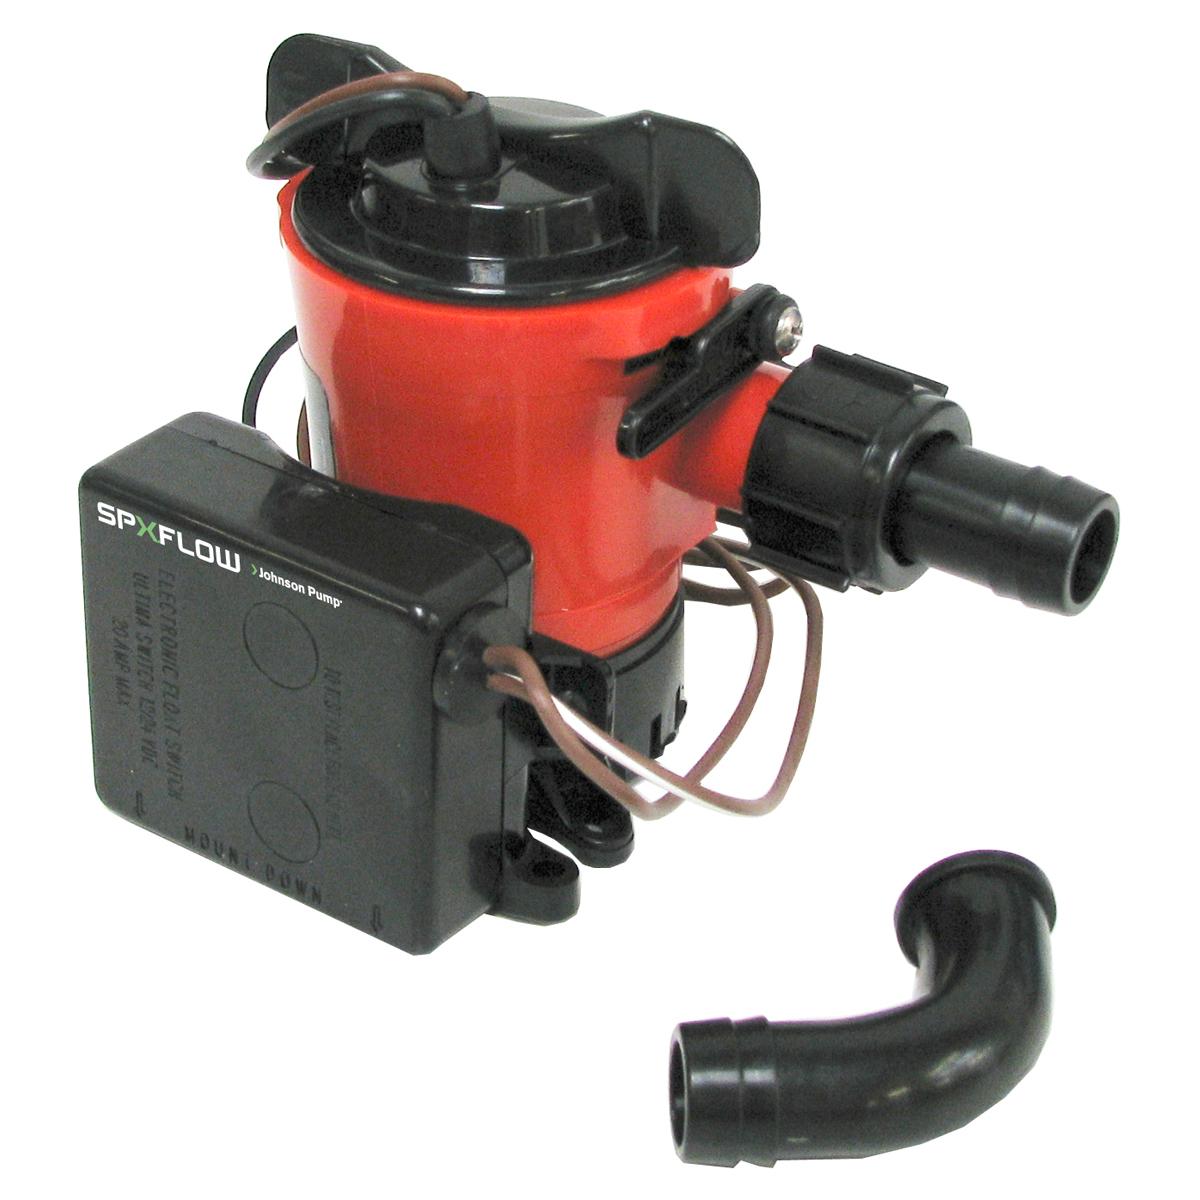 Johnson Pump Ultima Combo Pump - 500 GPH Open Flow photo